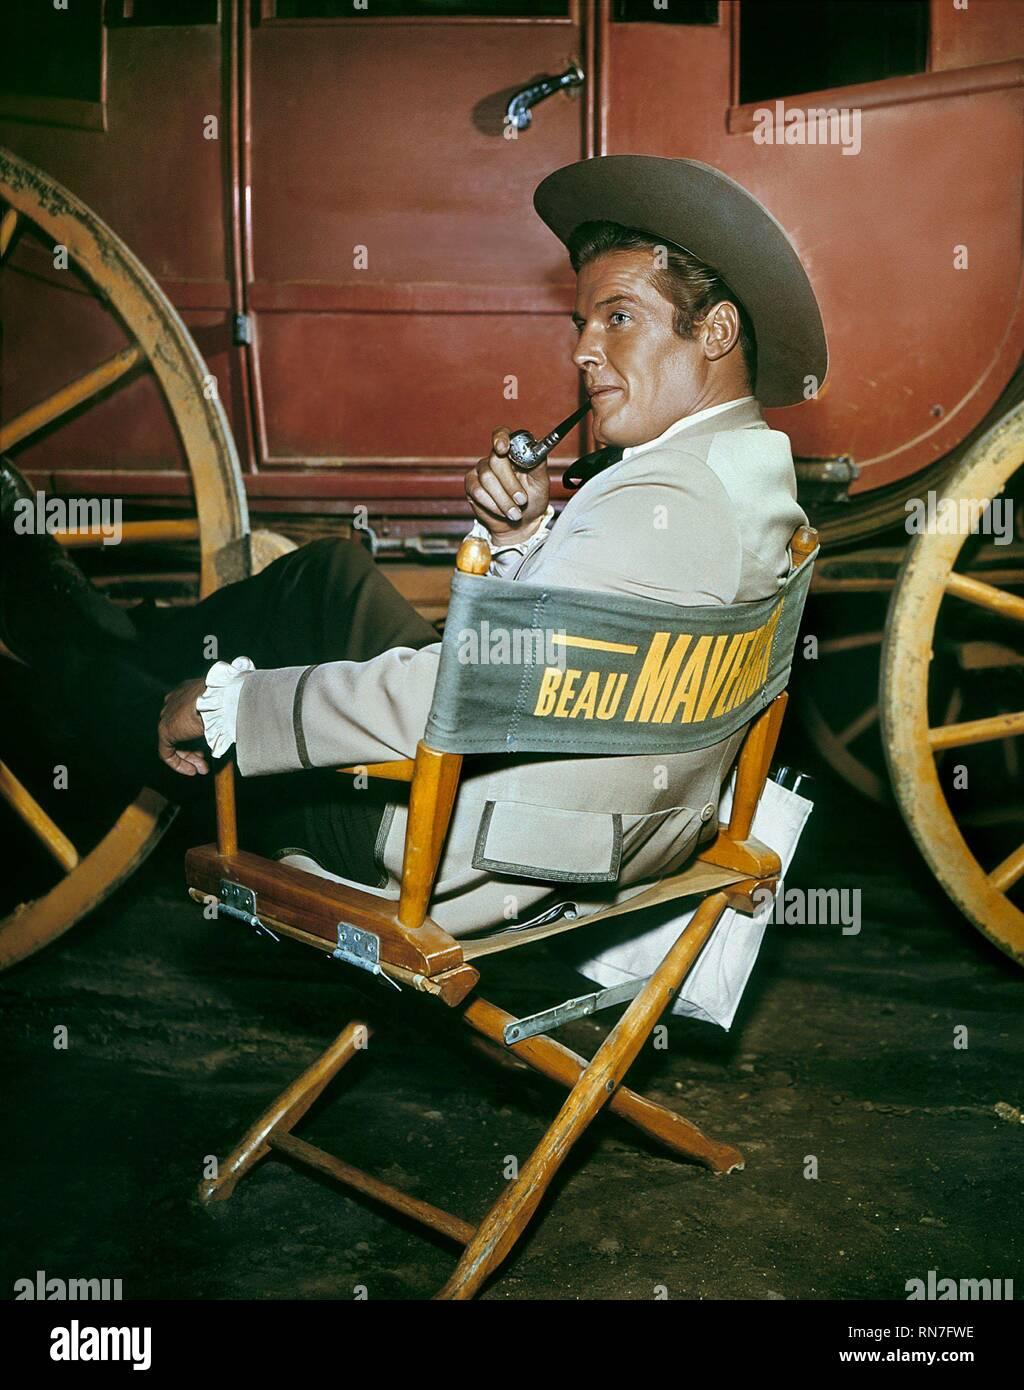 ROGER MOORE, MAVERICK, 1960 - Stock Image